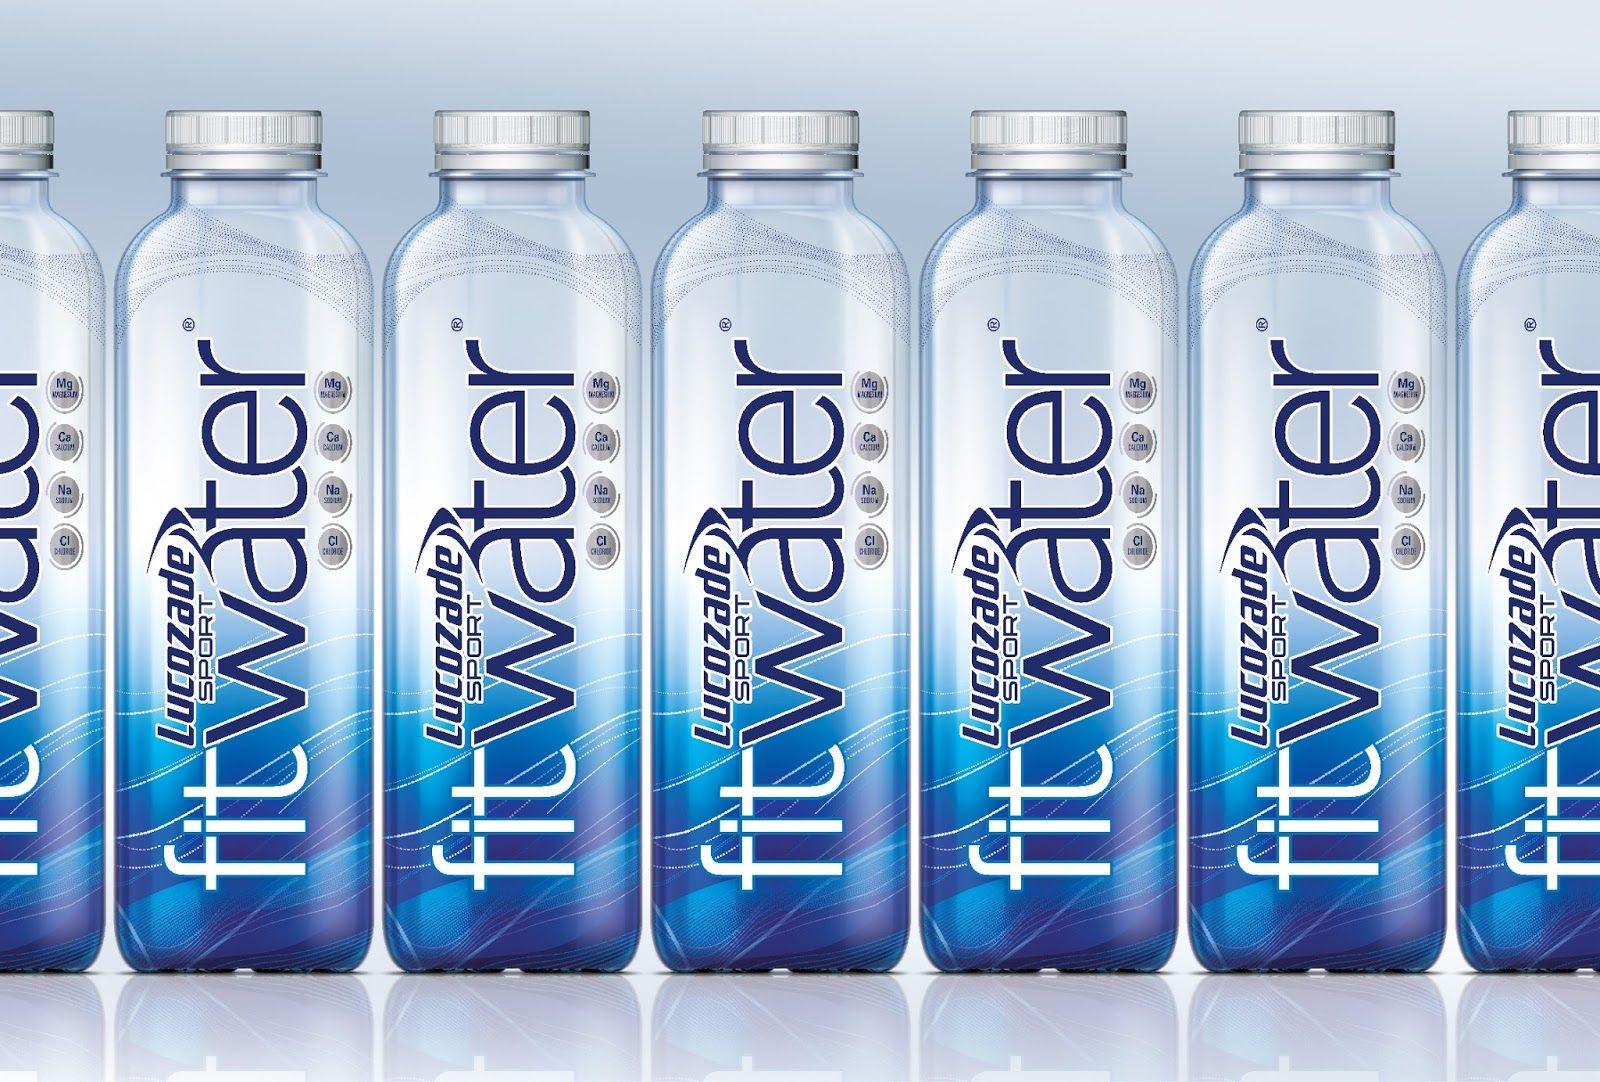 Fitwater Bottle Design Water Water Bottle Label Design Bottle